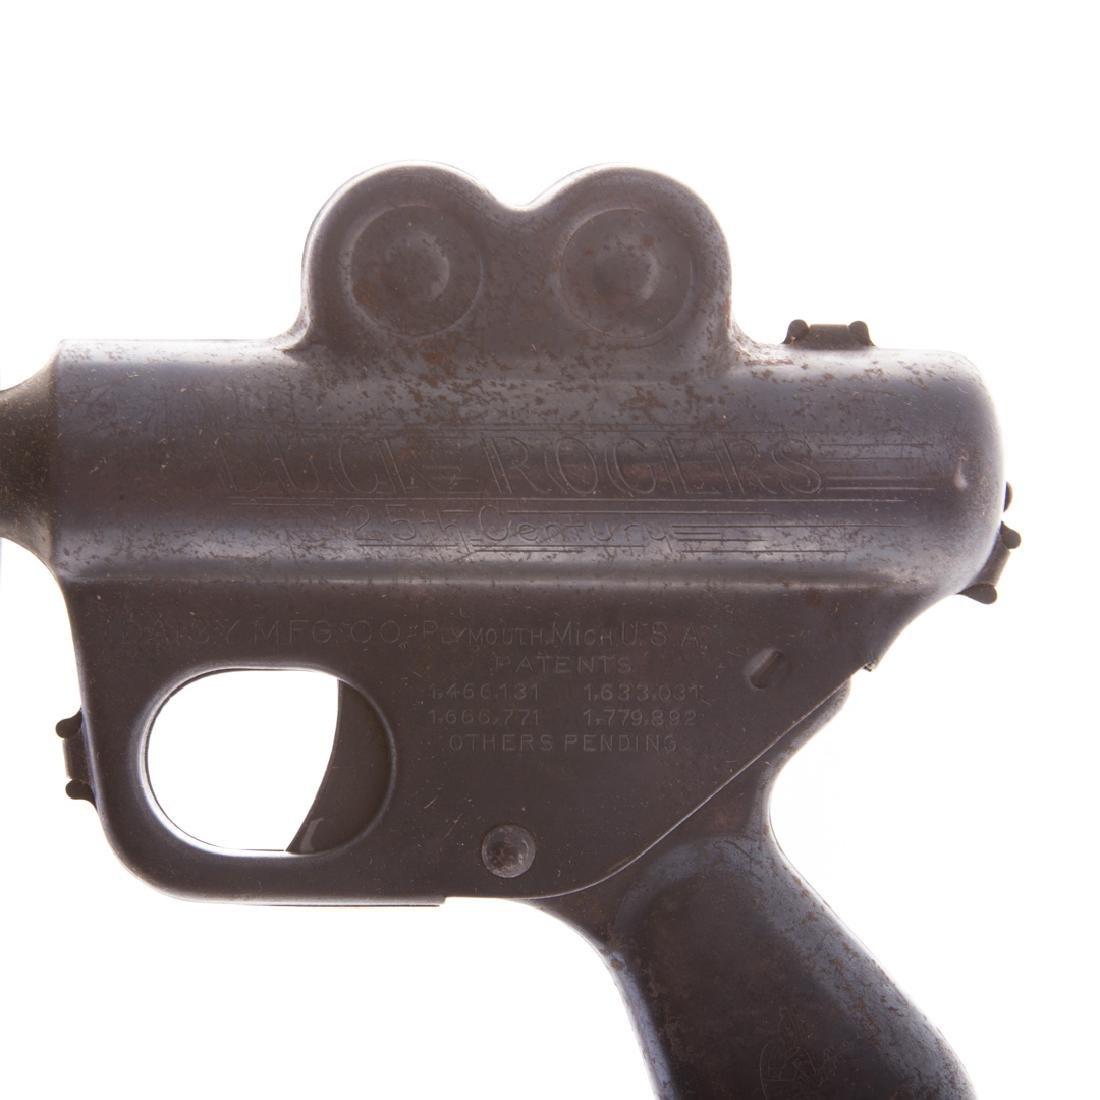 Buck Rogers 25th Century Rocket Pistol with Box - 3